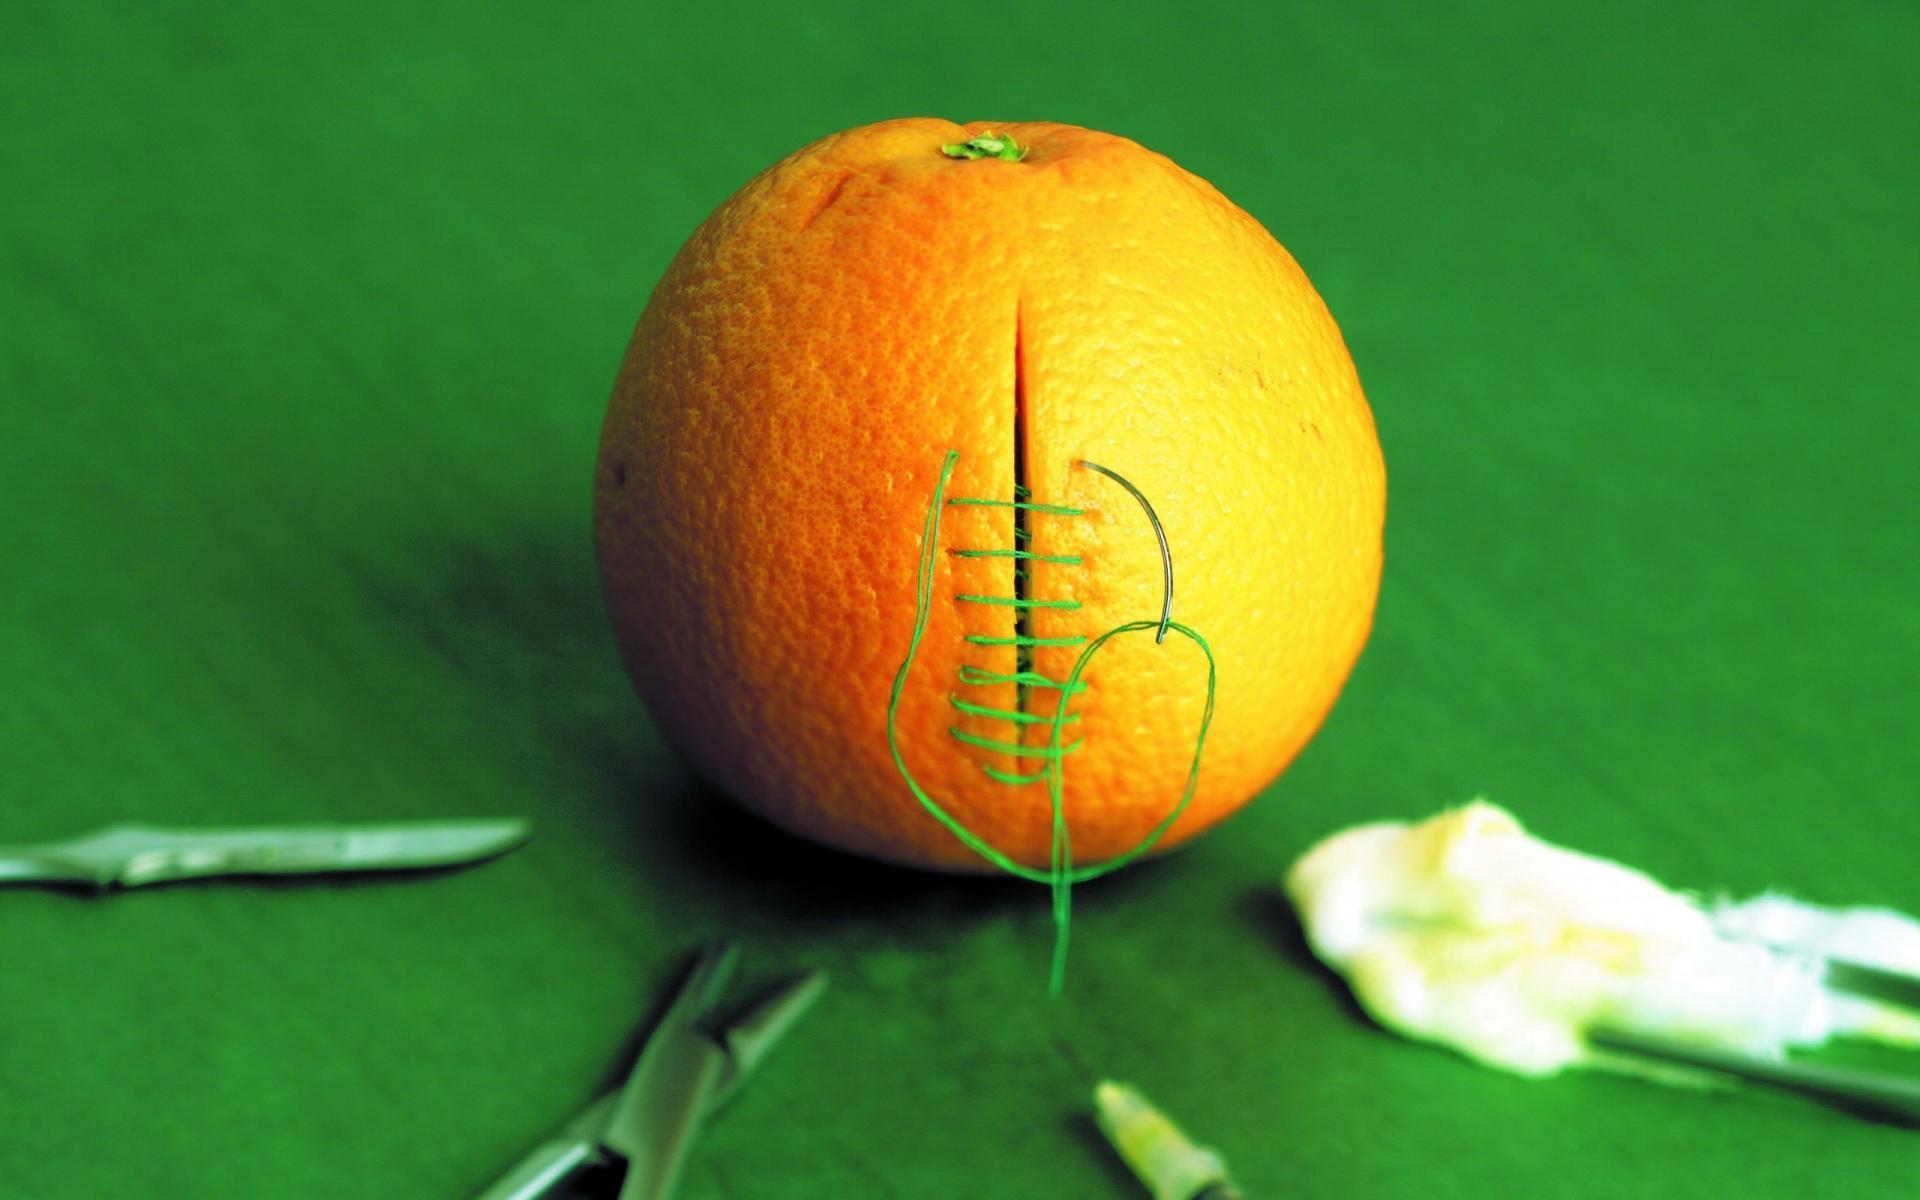 Orange funny medical stitch cutting green background wallpaper 1920x1200